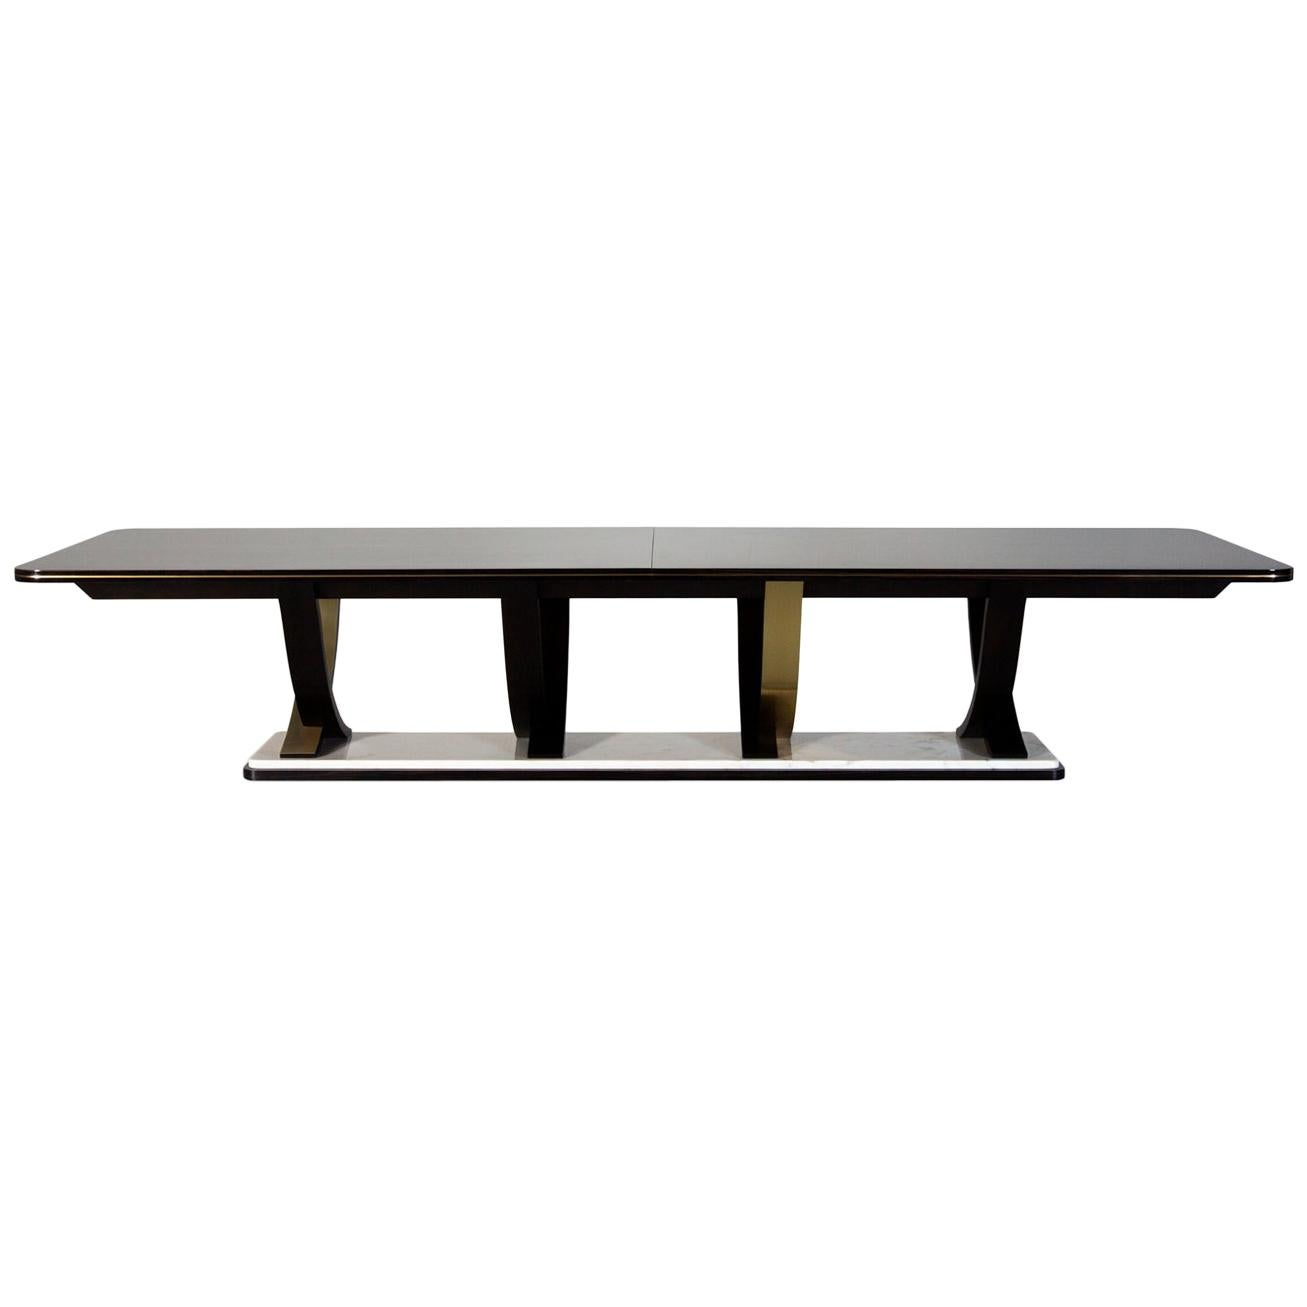 Fontaine 12-Seat Extendable Dining Table Macassar Ebony Brass Calacatta Bianco